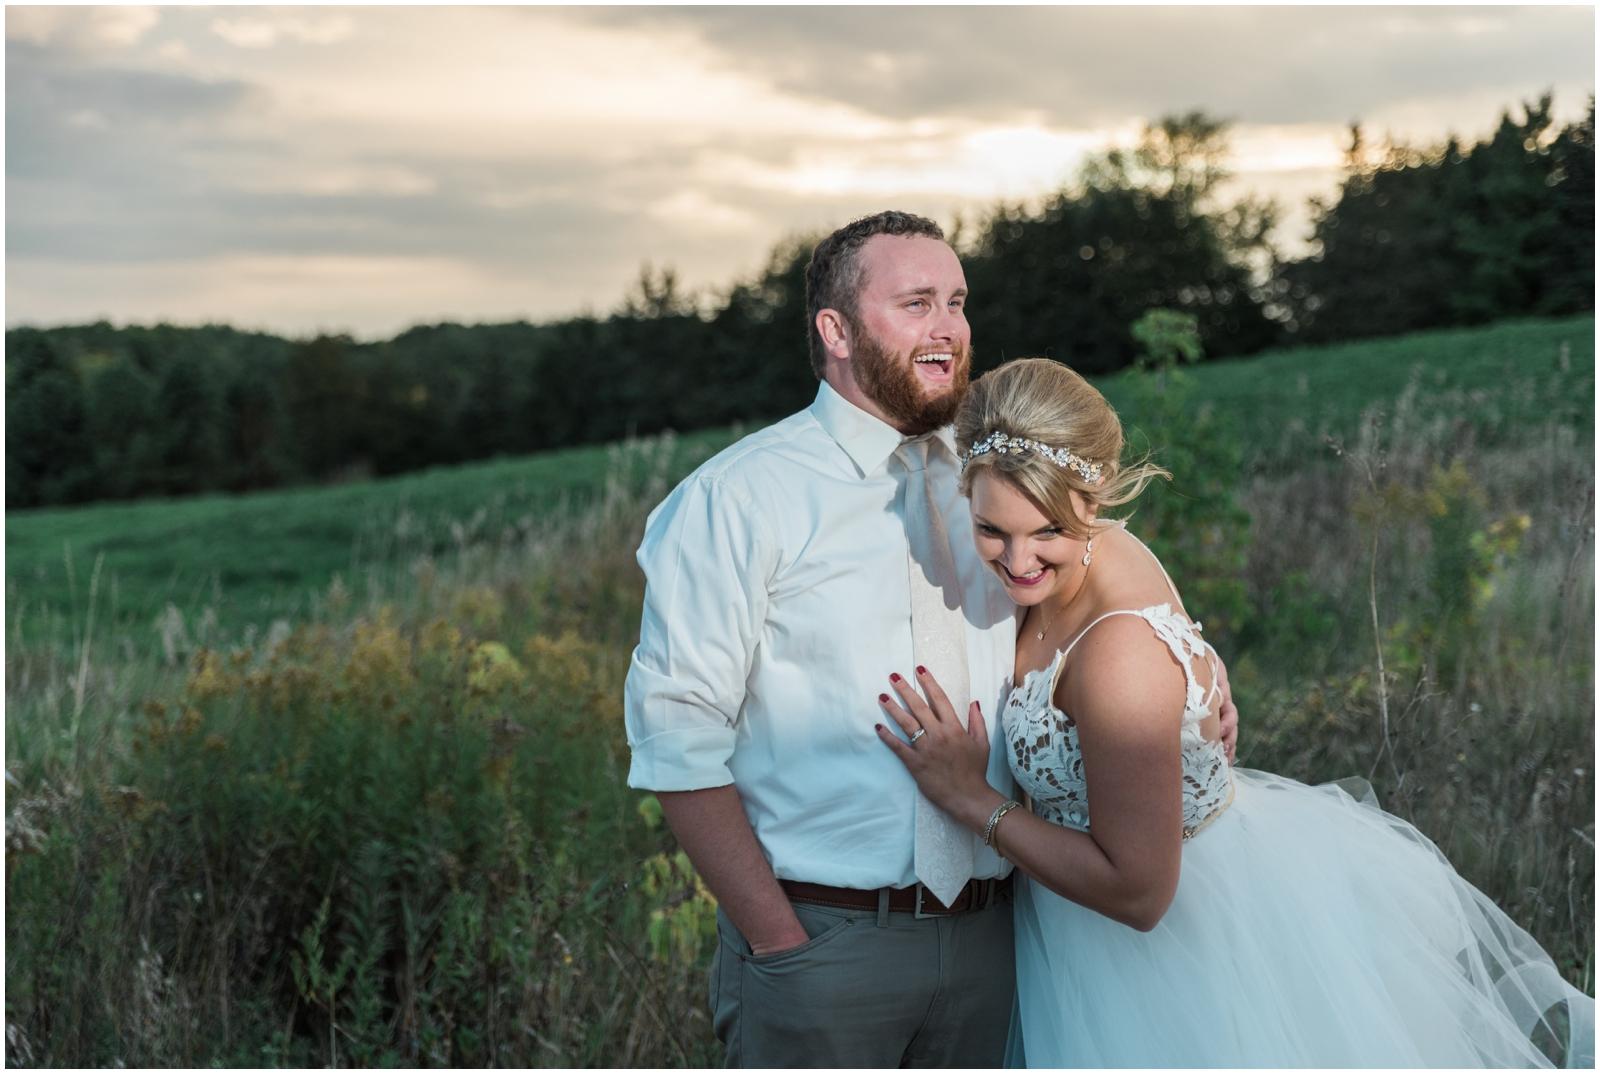 Minnesota-Wedding-Venue- Chaska-MN-Rustic-Barn-Weddings_0580.jpg